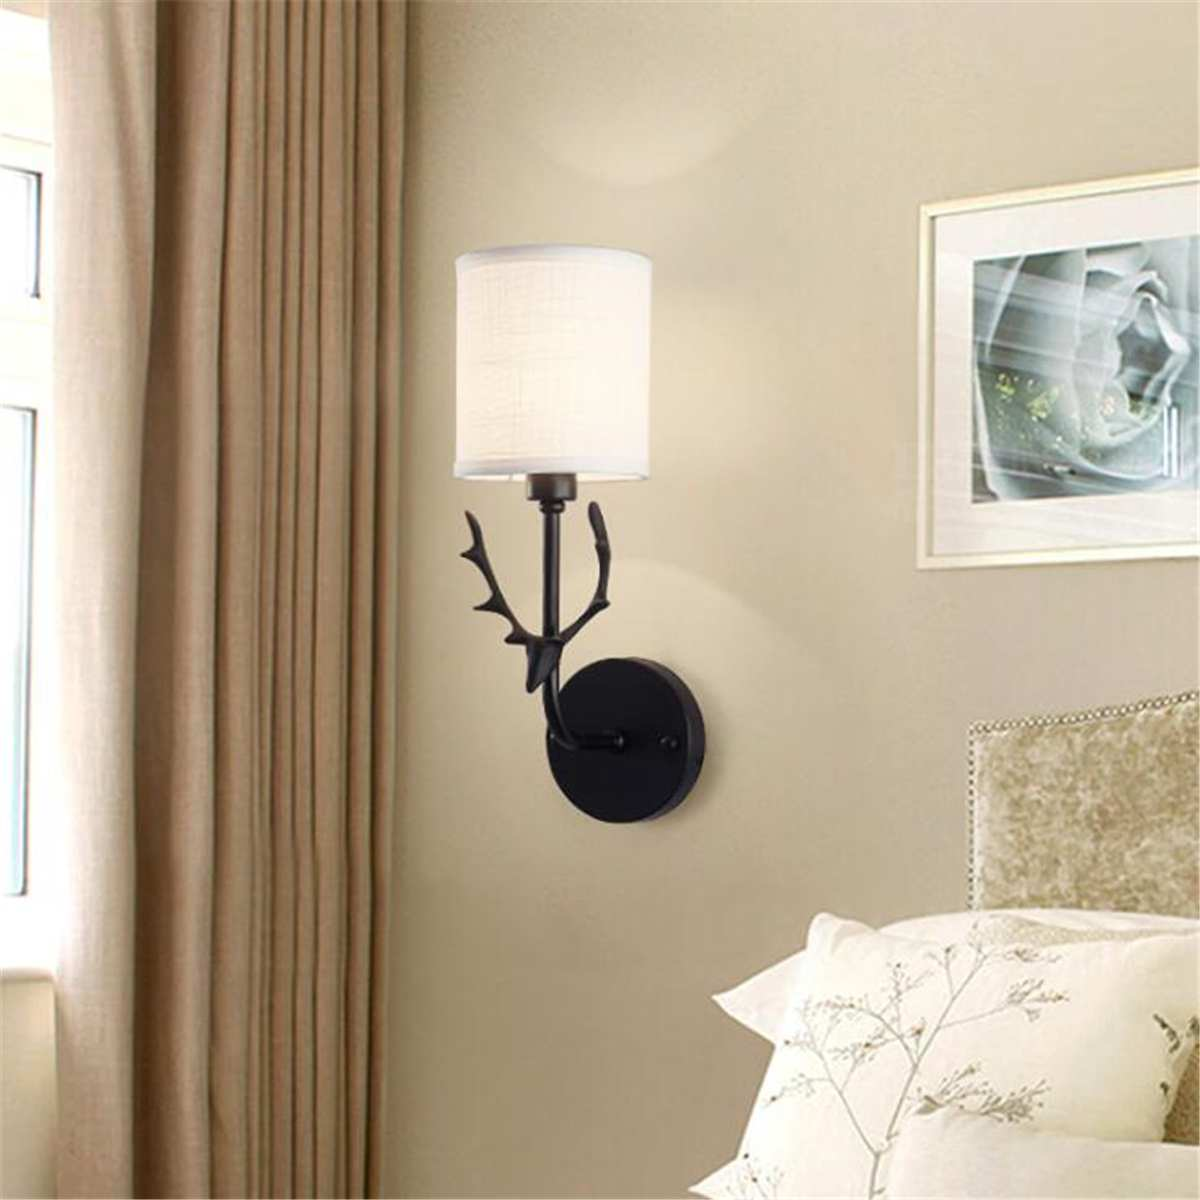 Lights & Lighting Interior Design Deer Wall Light Fabric Lampshade Bedroom Bedside Wall Lamp Sconce Fixtures Nordic Style Indoor Lighting Decor